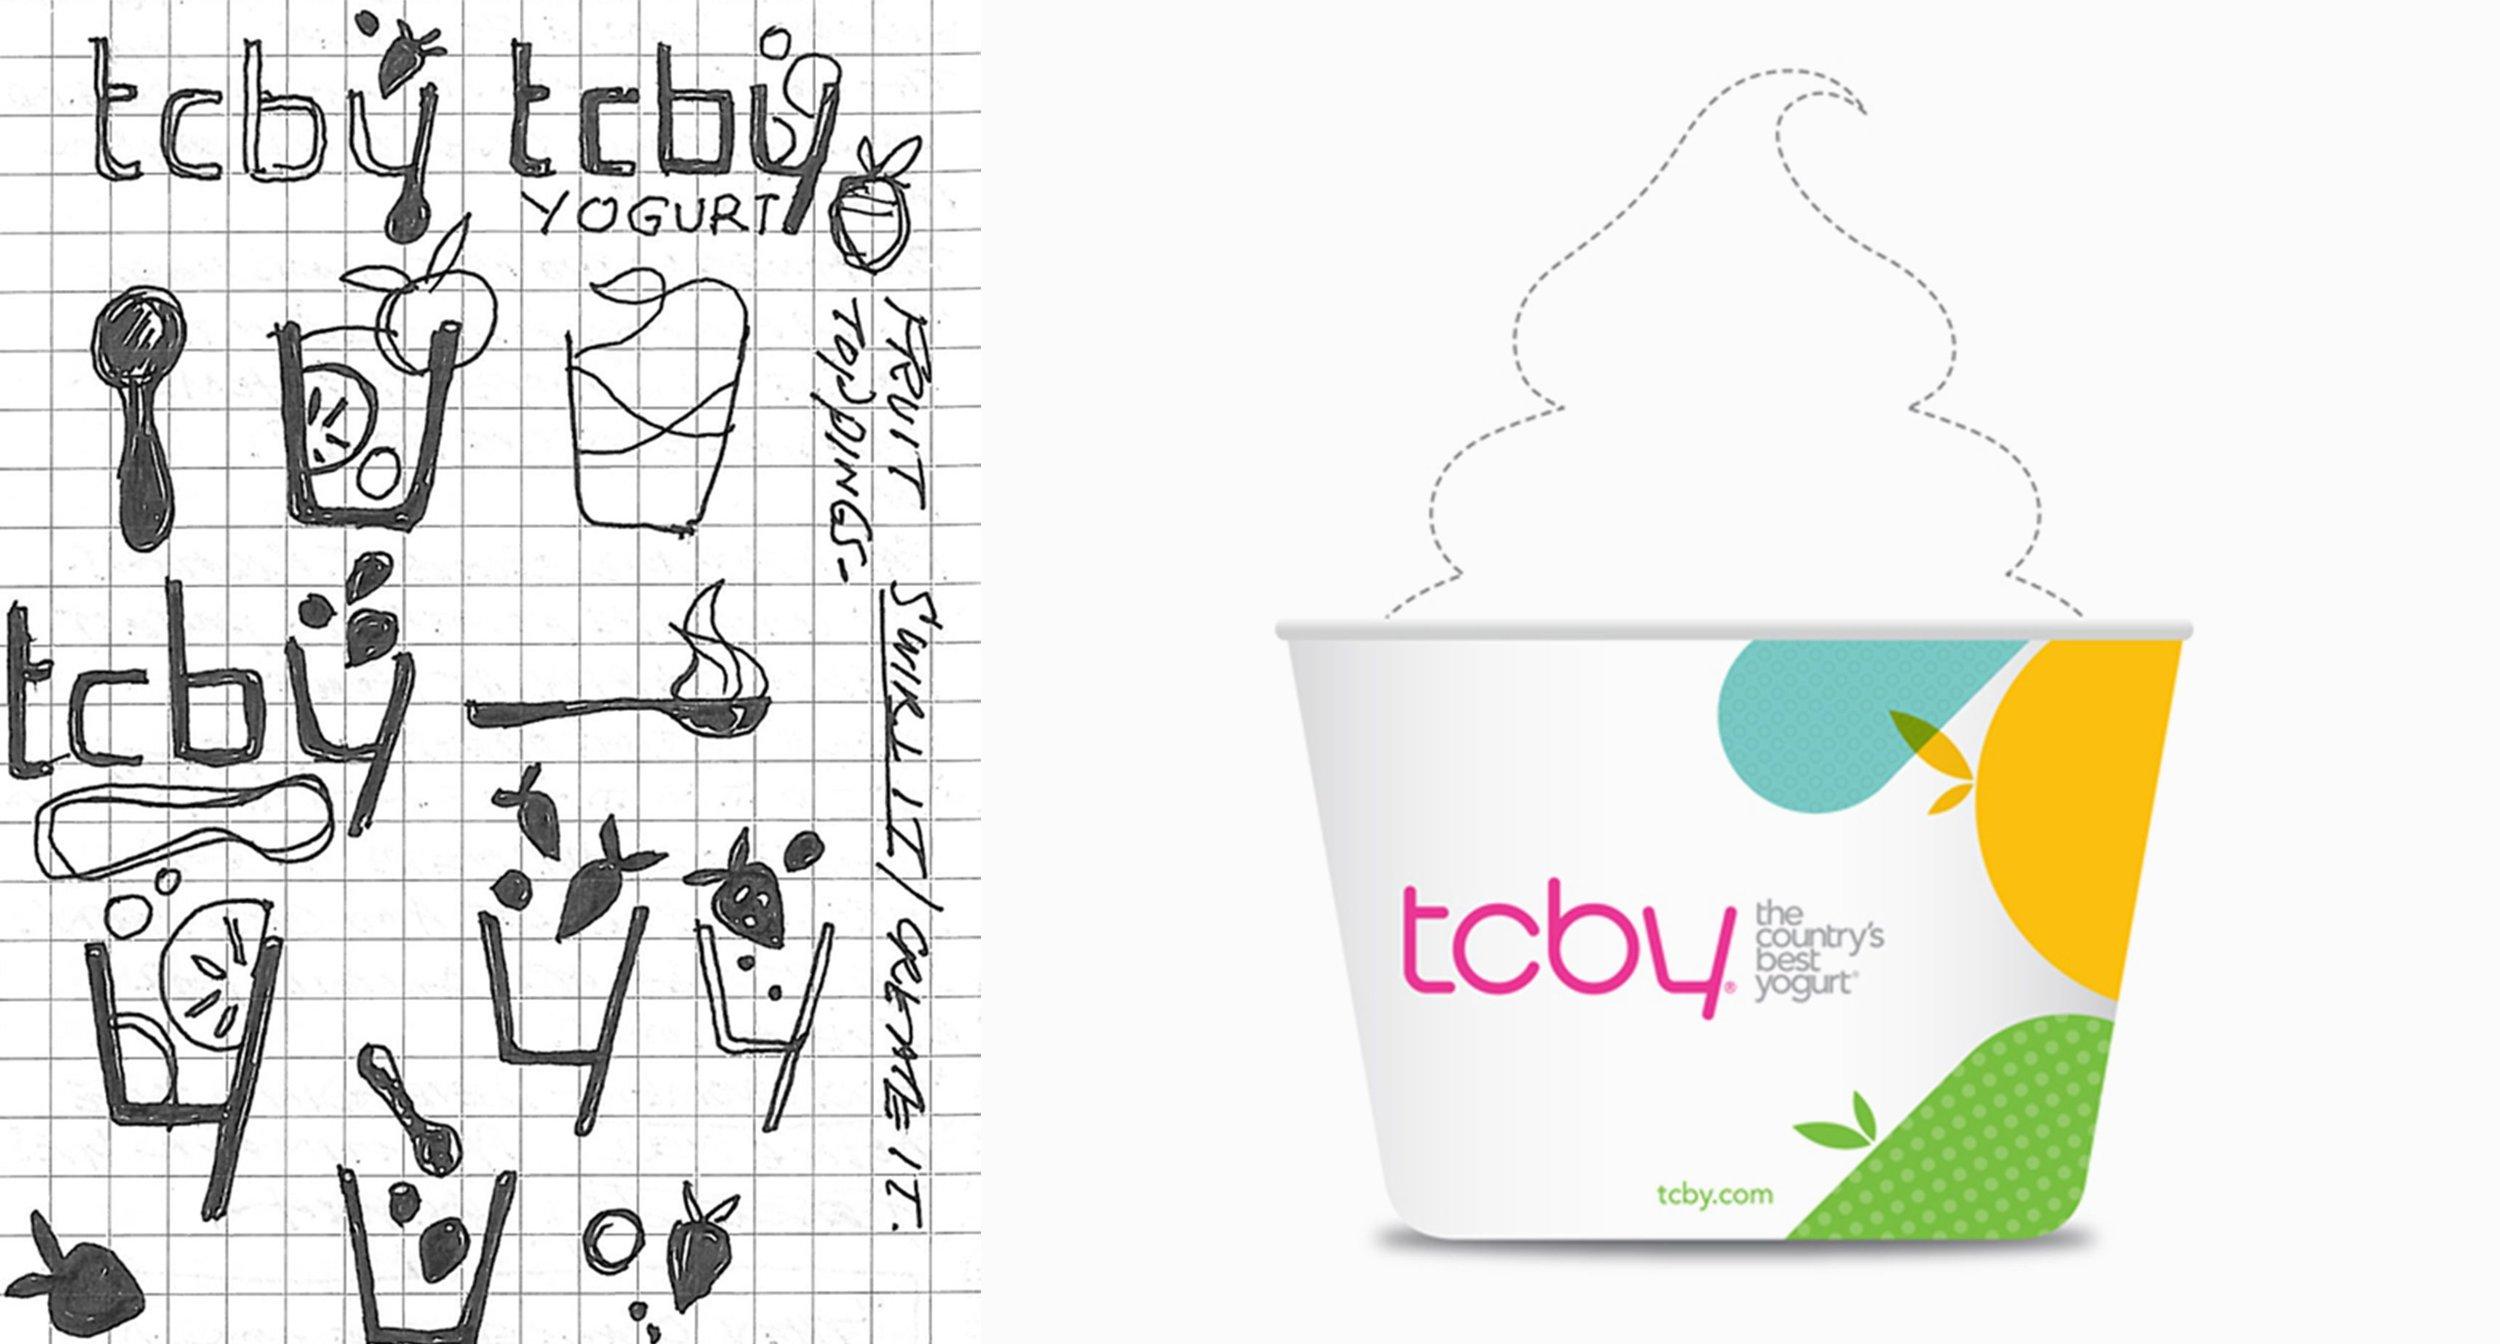 Sketch and final TCBY yogurt cup